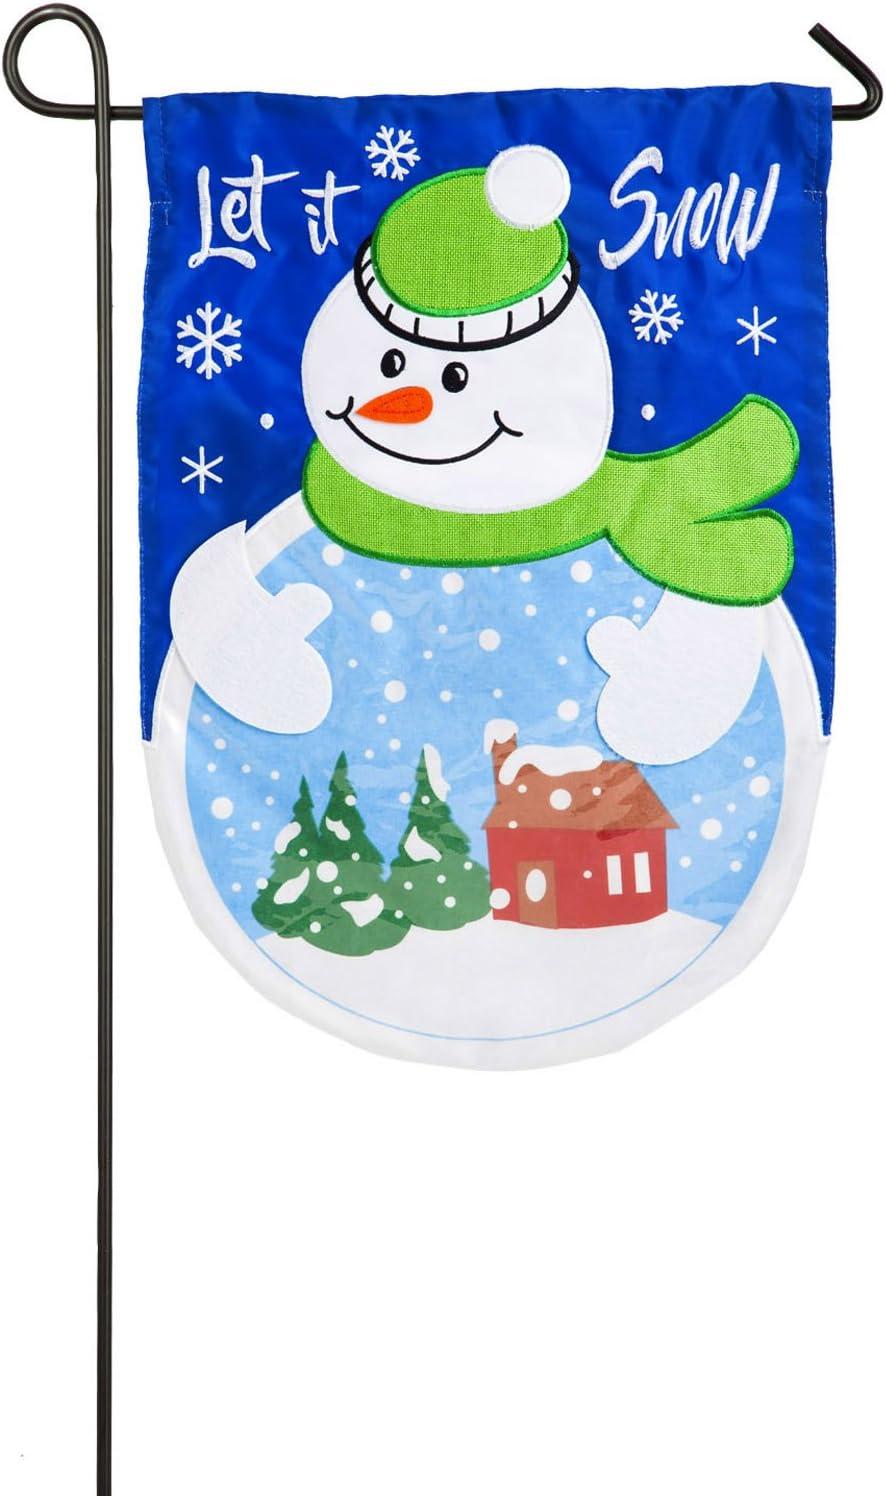 Evergreen Let it Snow-Globe Applique Garden Flag, 12.5 x 18 inches